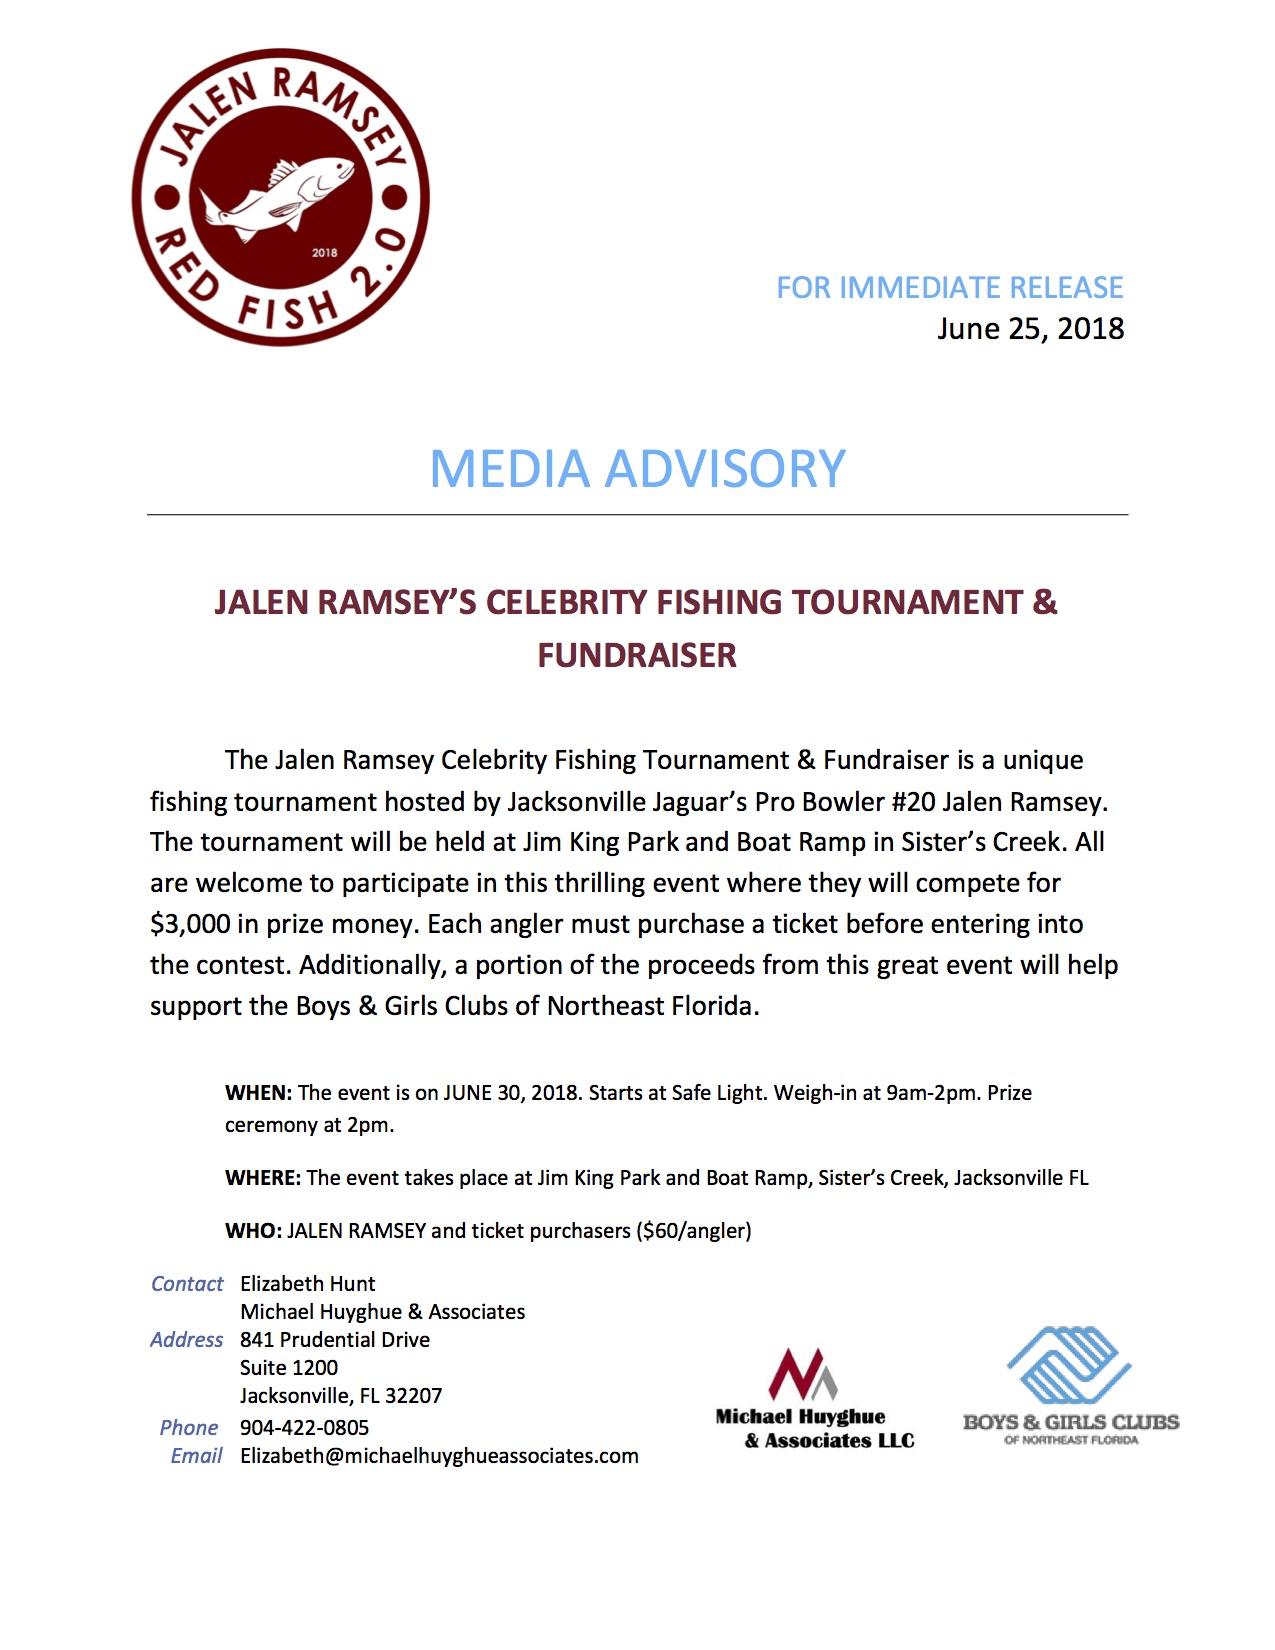 Media Advisory_Ramsey Fishing Tournament.jpg